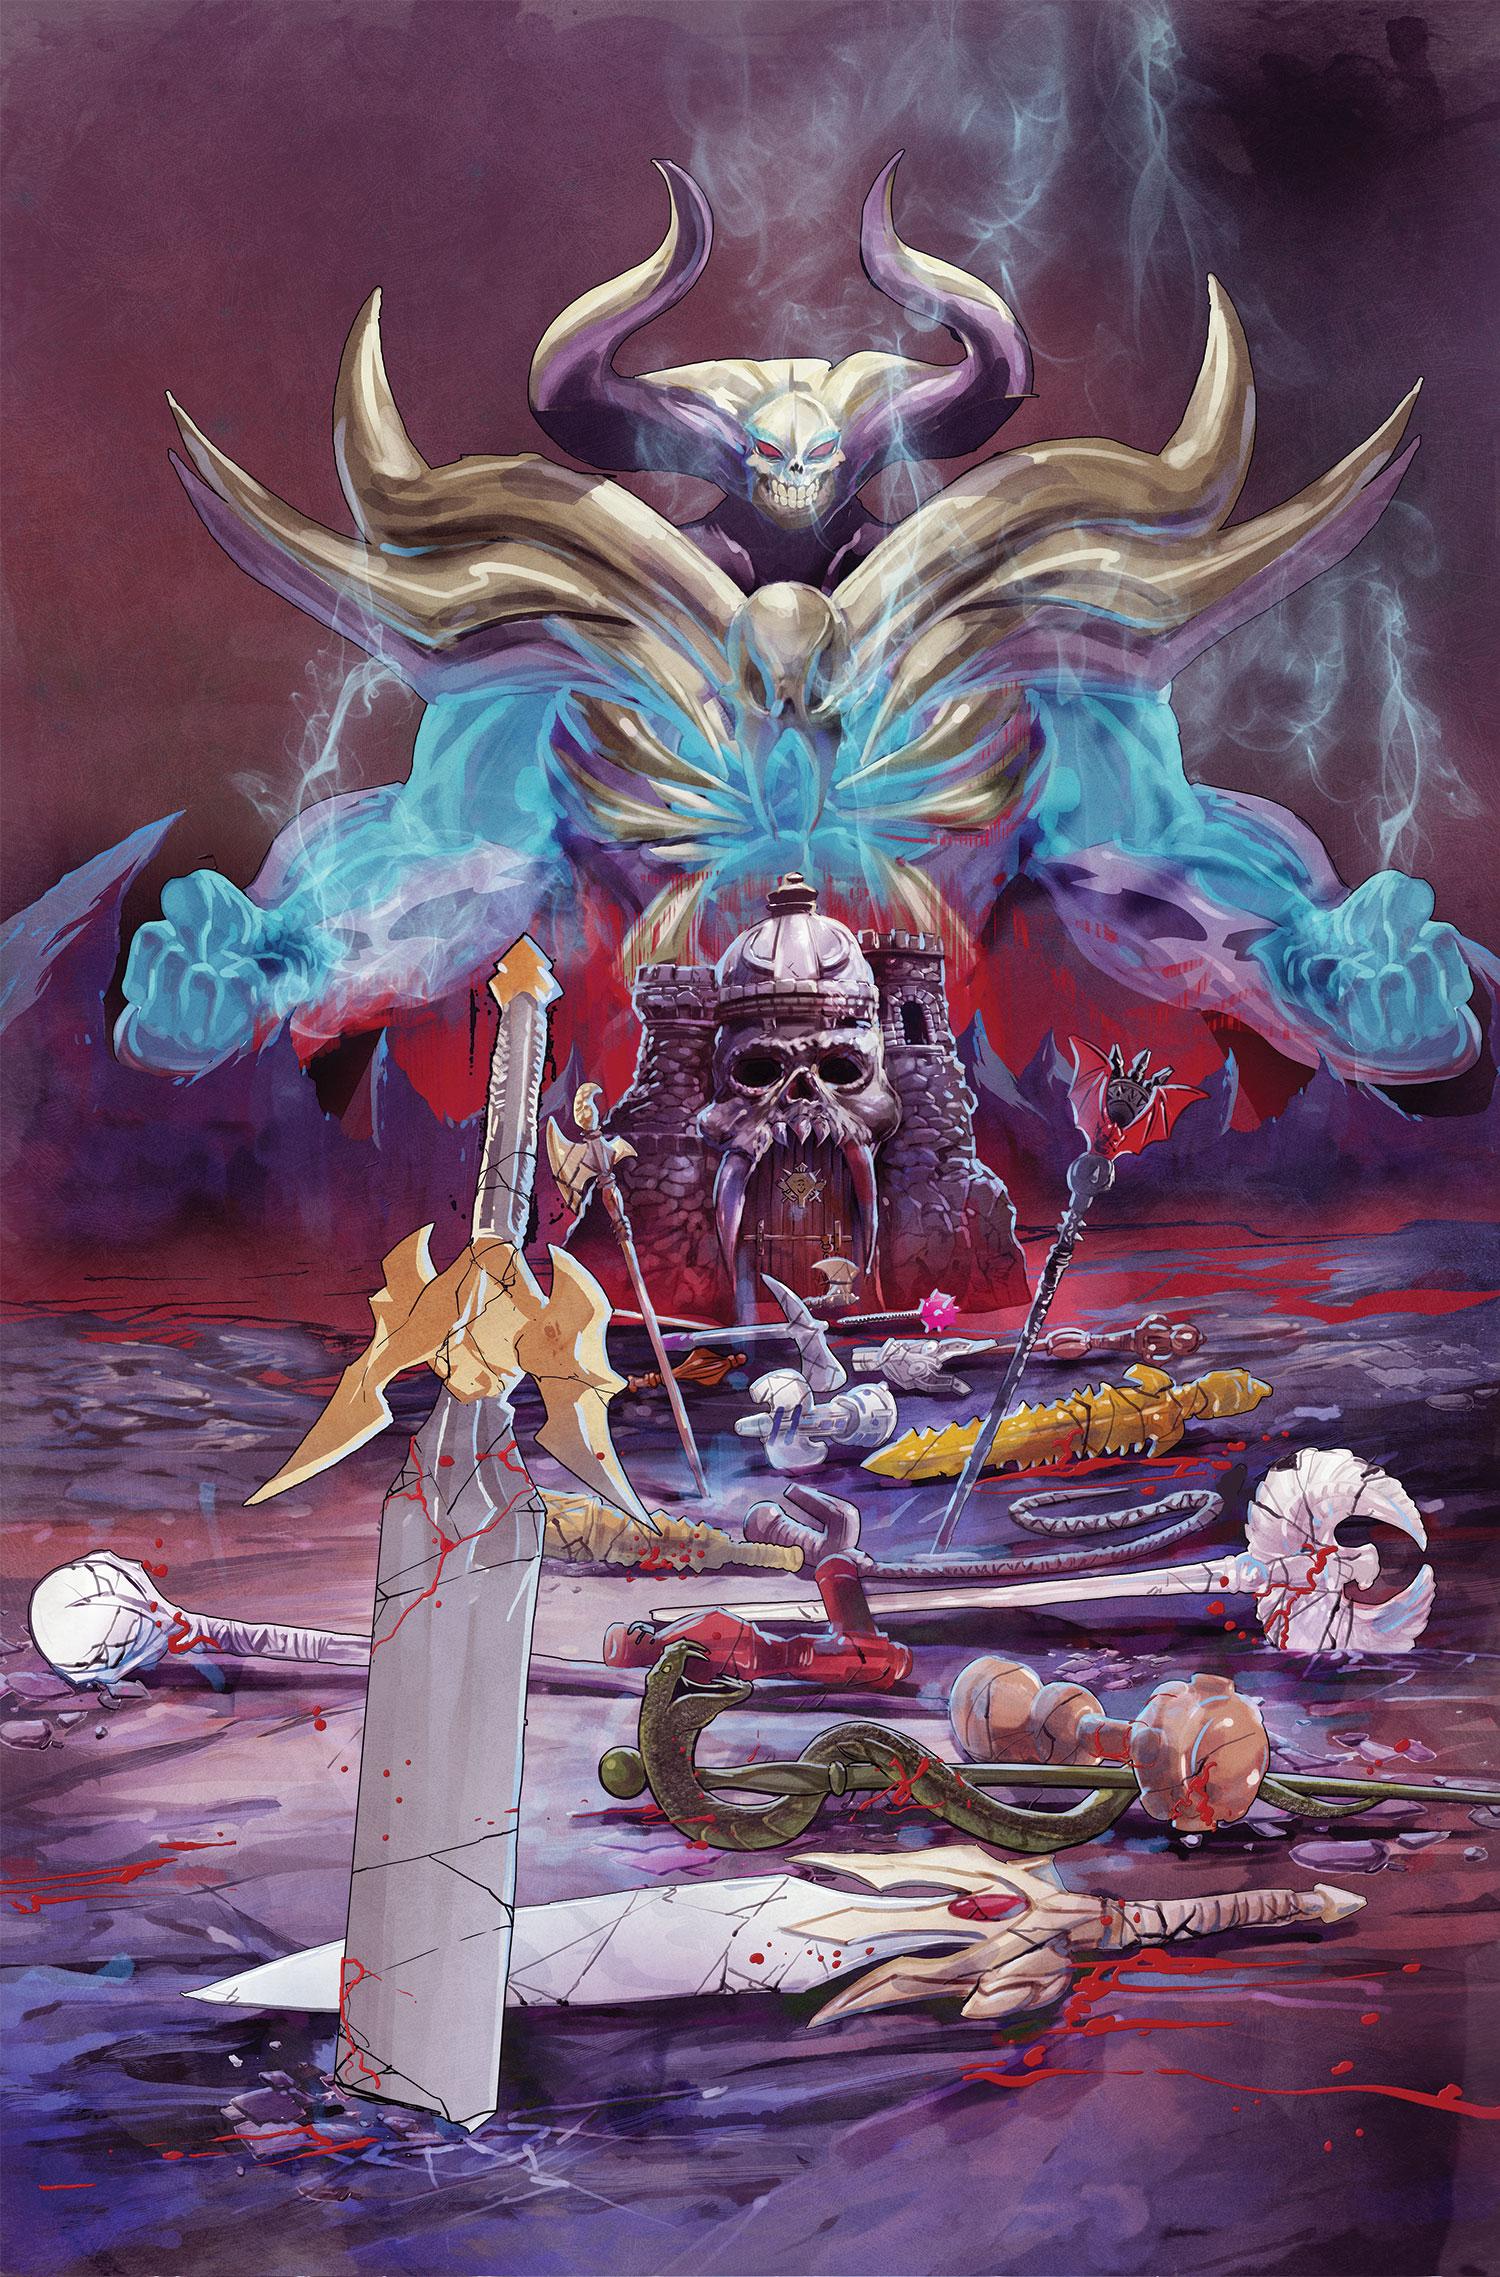 He-Man The Eternity War Vol 1 14 Textless.jpg